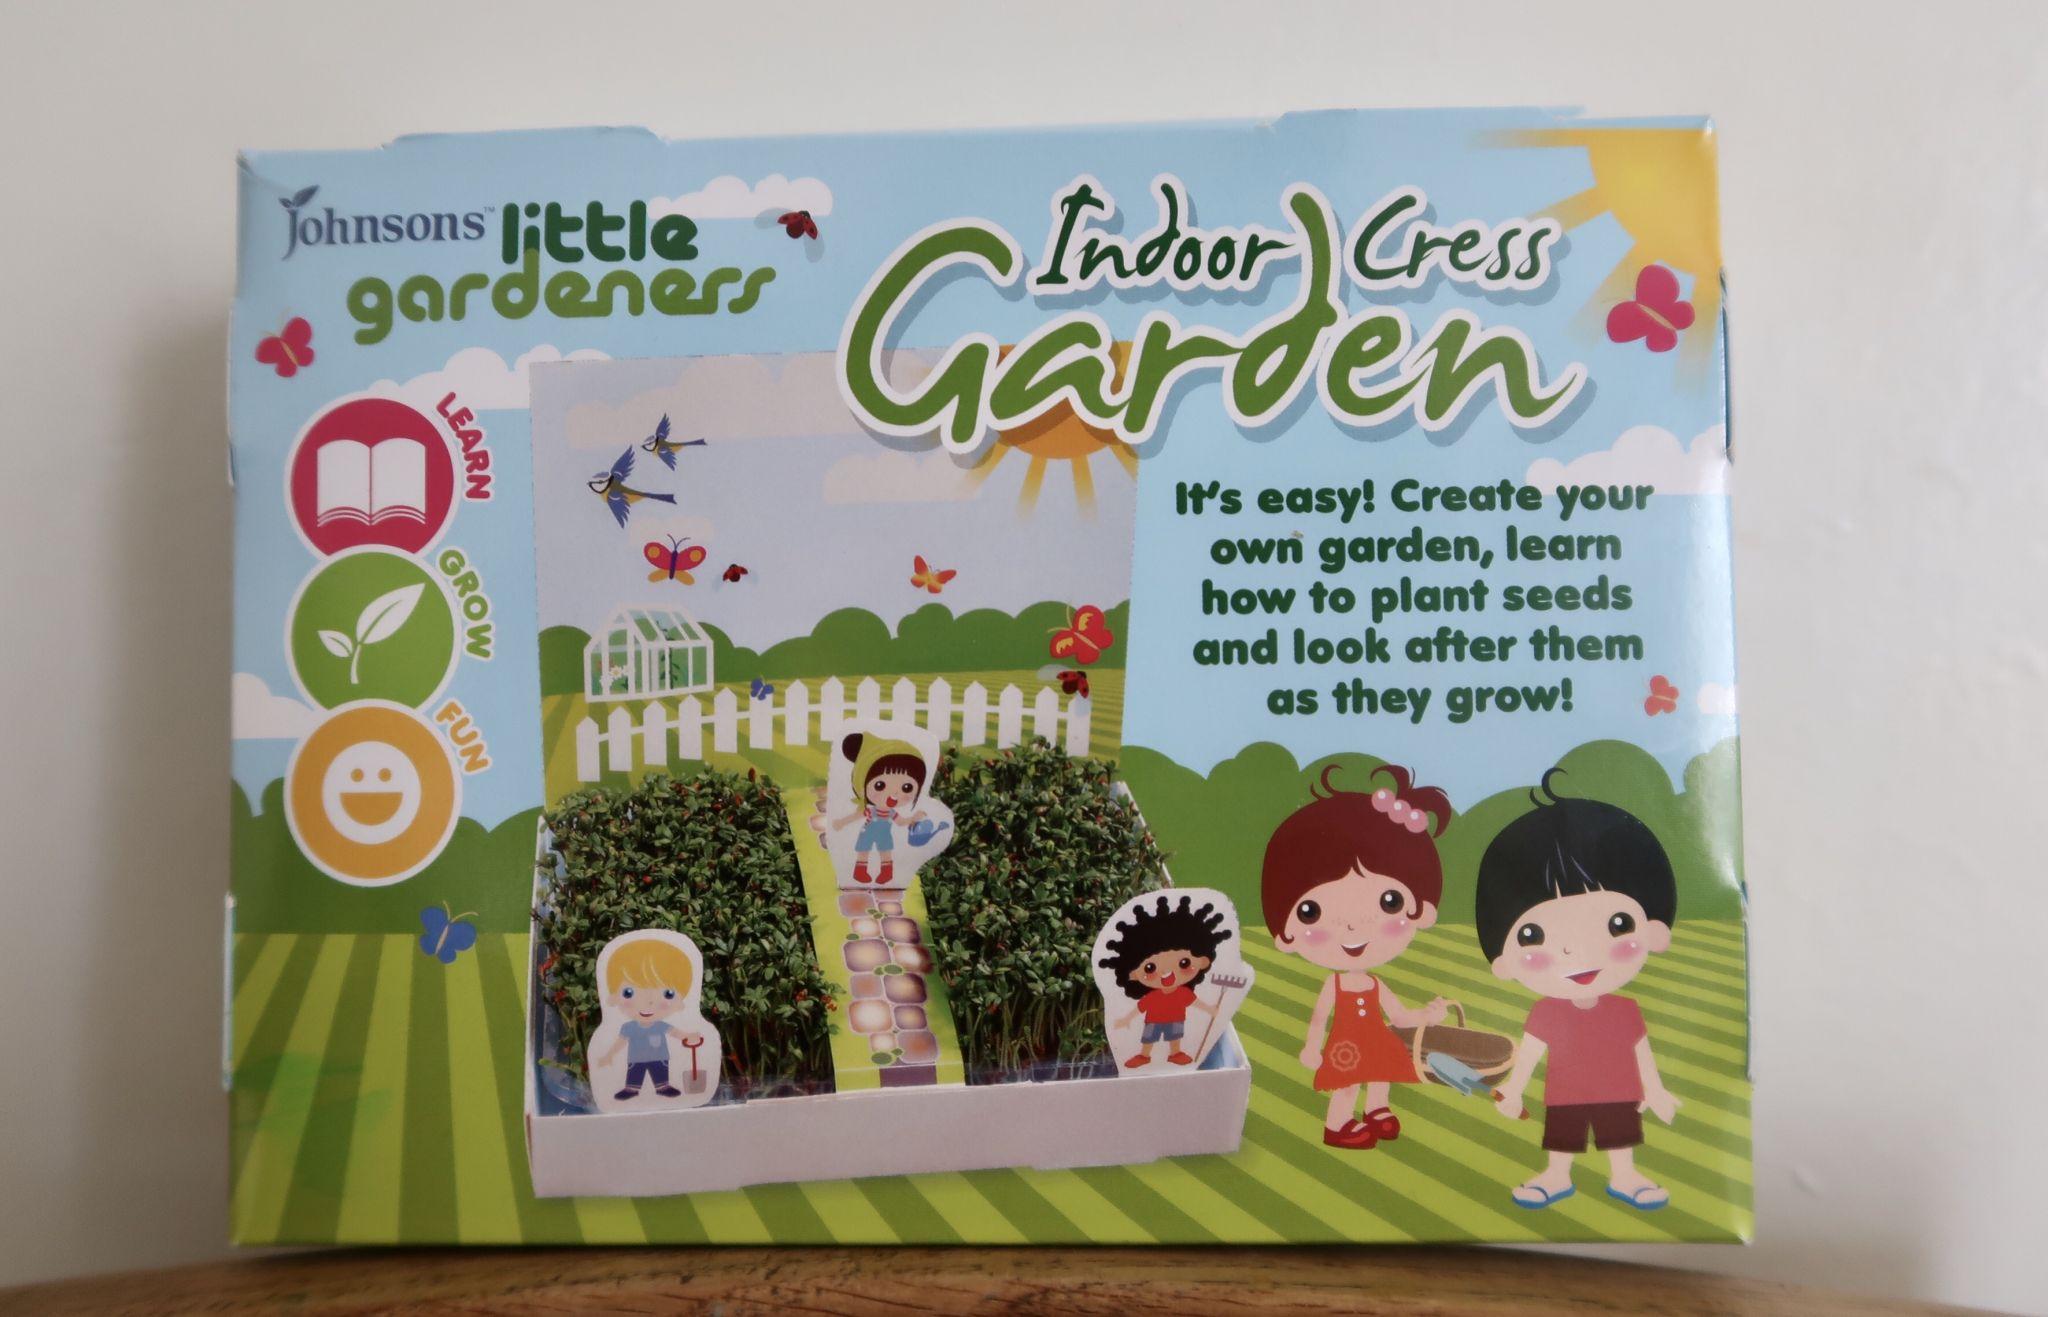 A box set of kids cress to grow